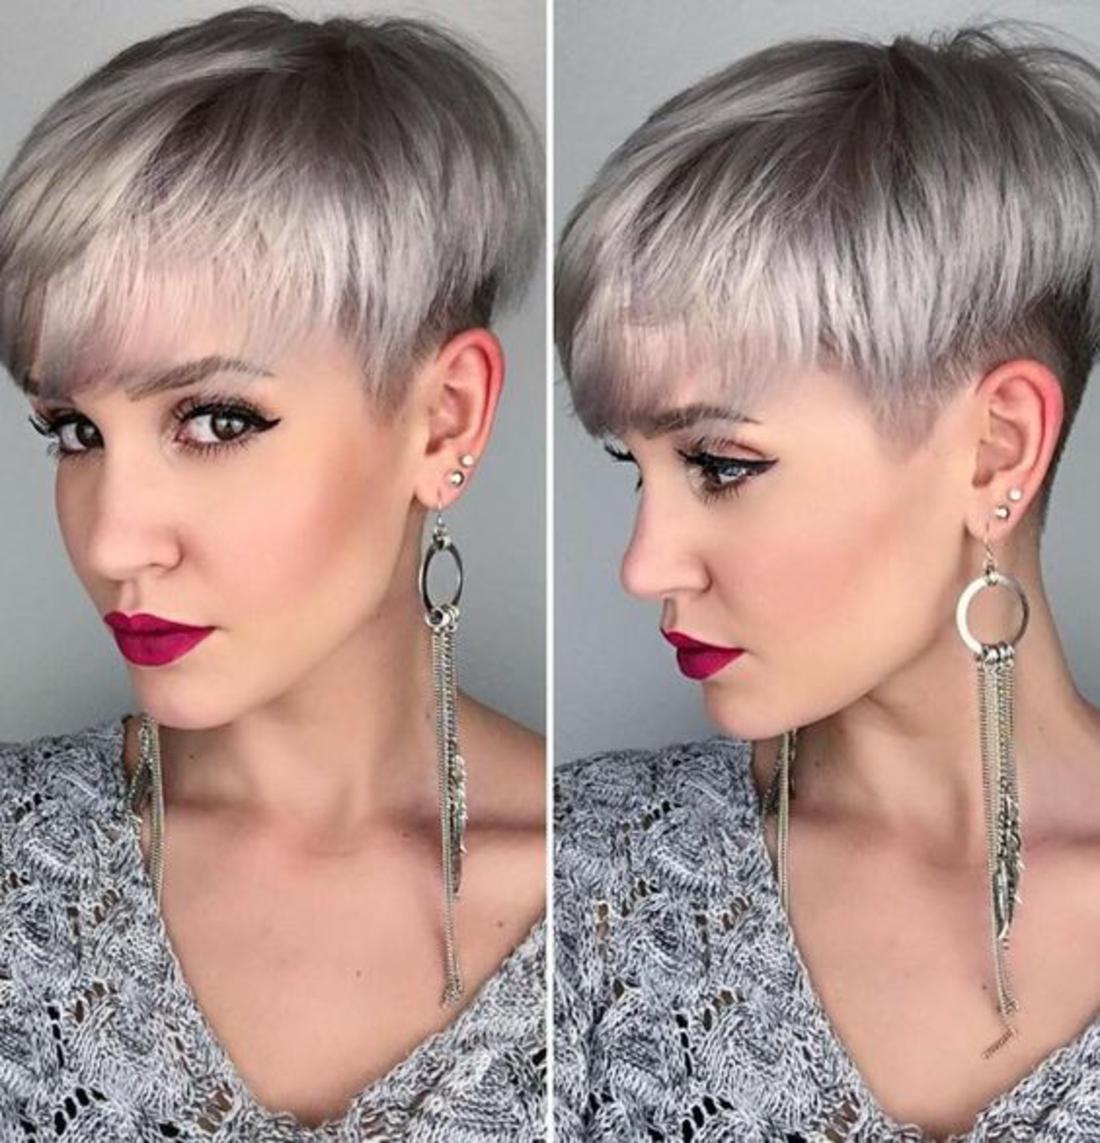 graues Haar mit längen Ohrringen runder Akzent roter Lippenstift - Damen Undercut